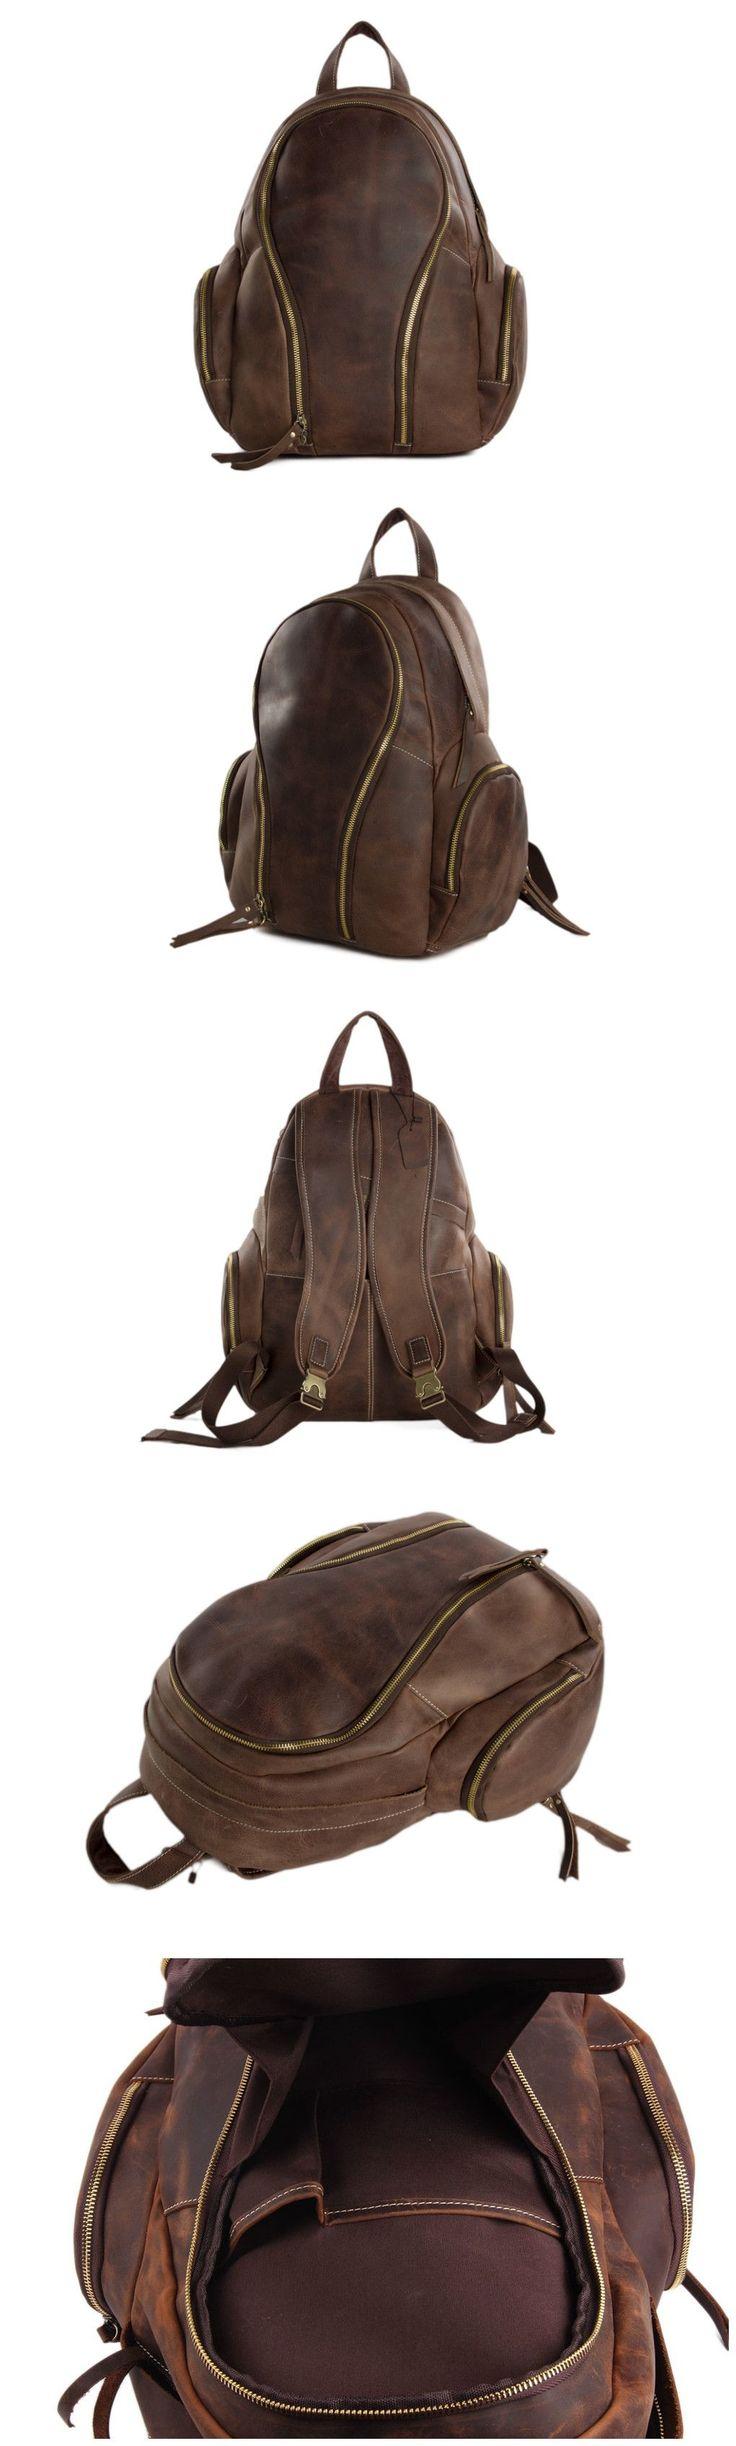 Genuine Leather Backpack /Travel Backpack /Laptop Bag School Backpack  http://ebagsbackpack.tumblr.com/